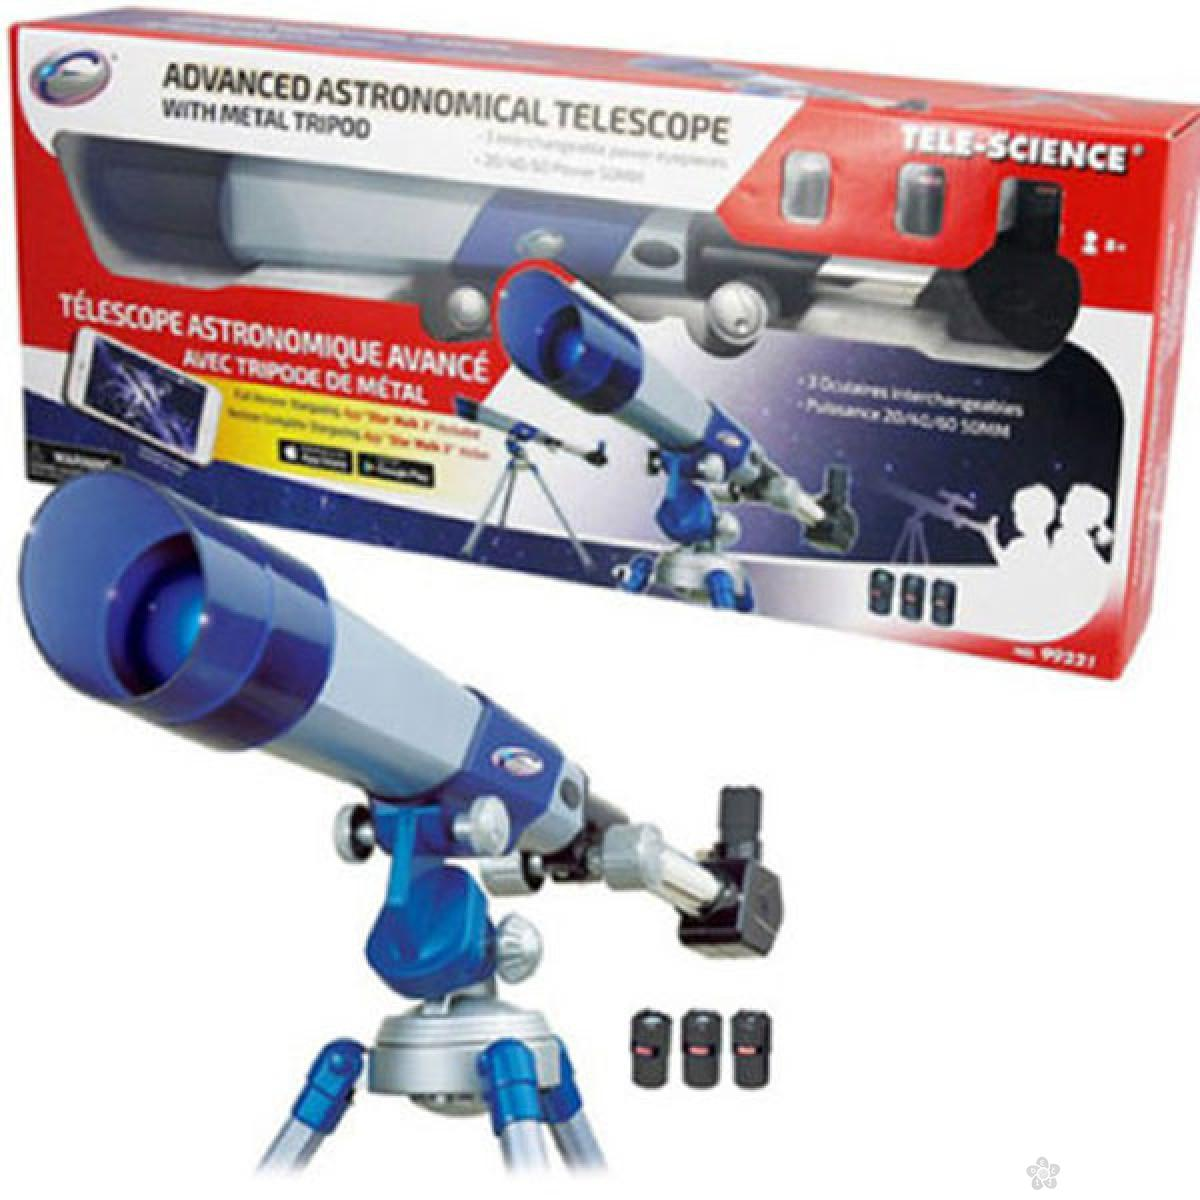 Astronomski teleskop sa stalkom 99221